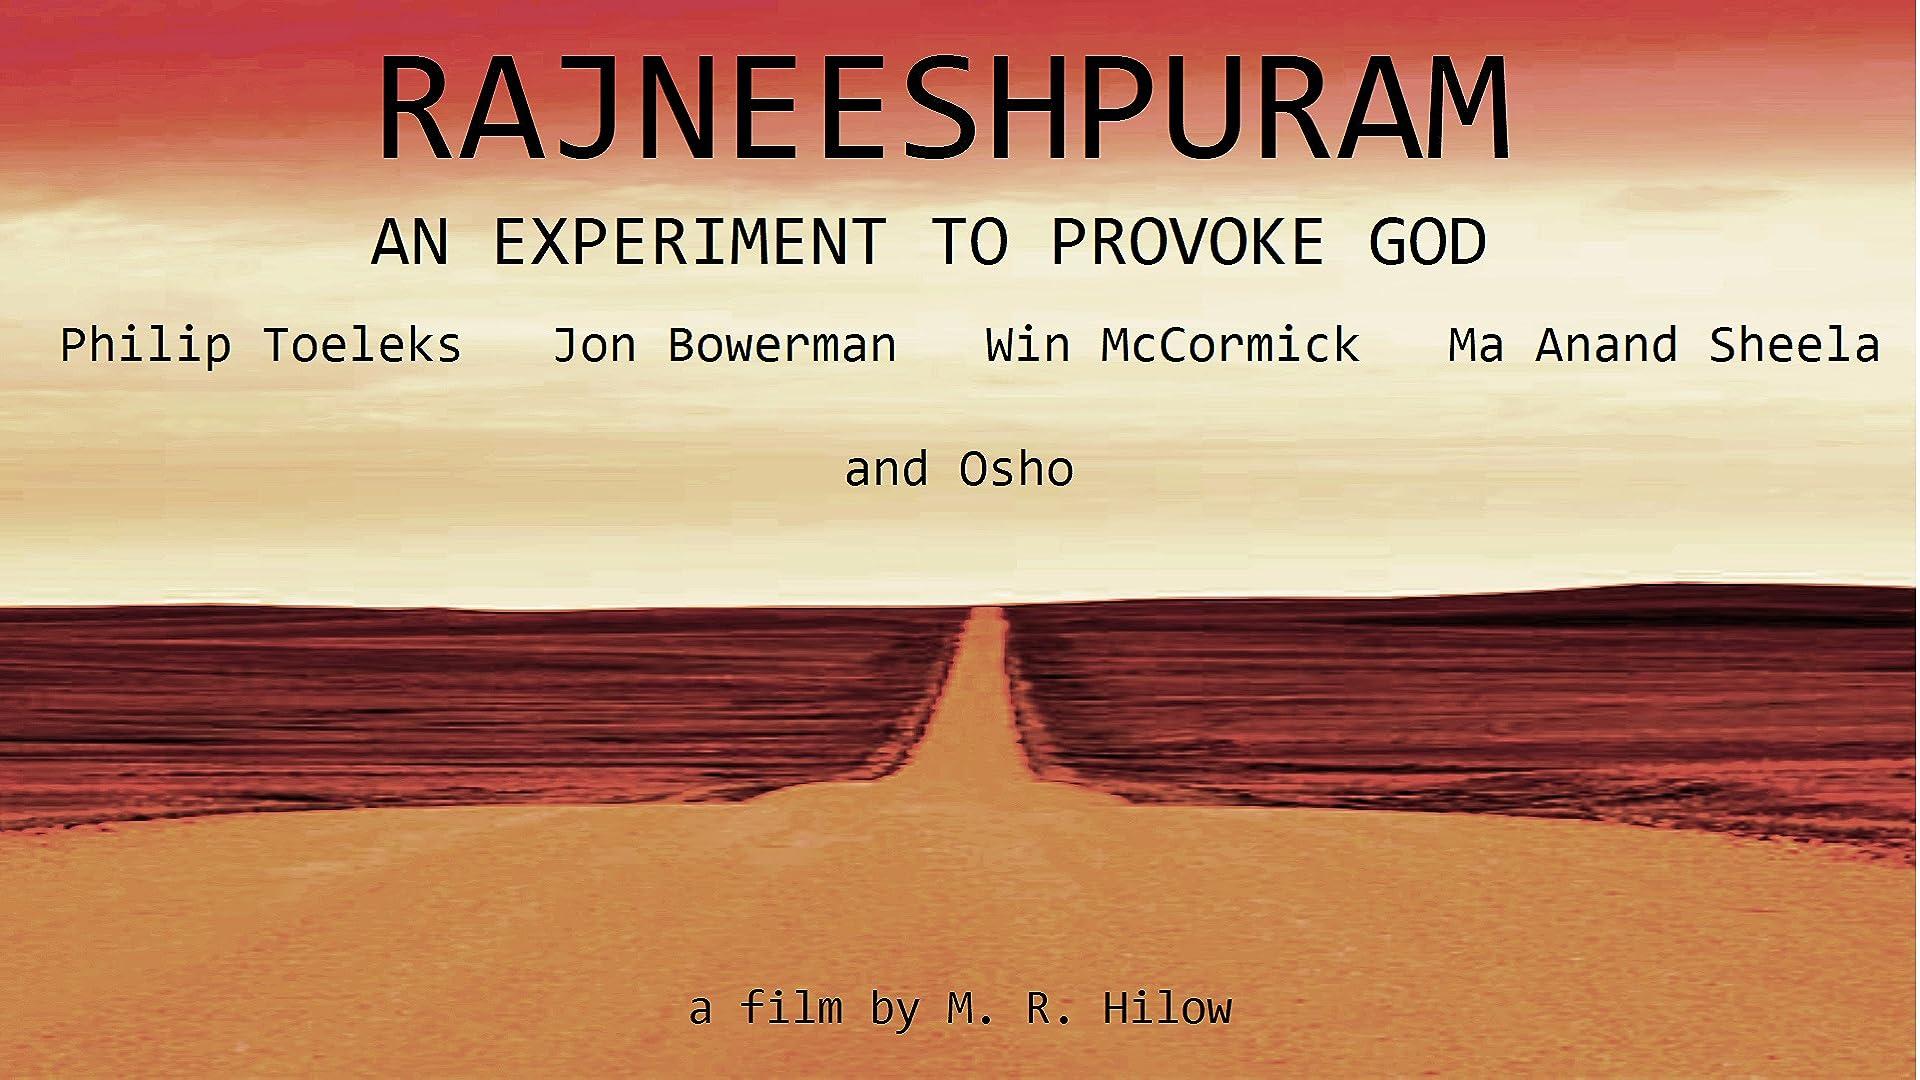 Rajneeshpuram, an Experiment to Provoke God